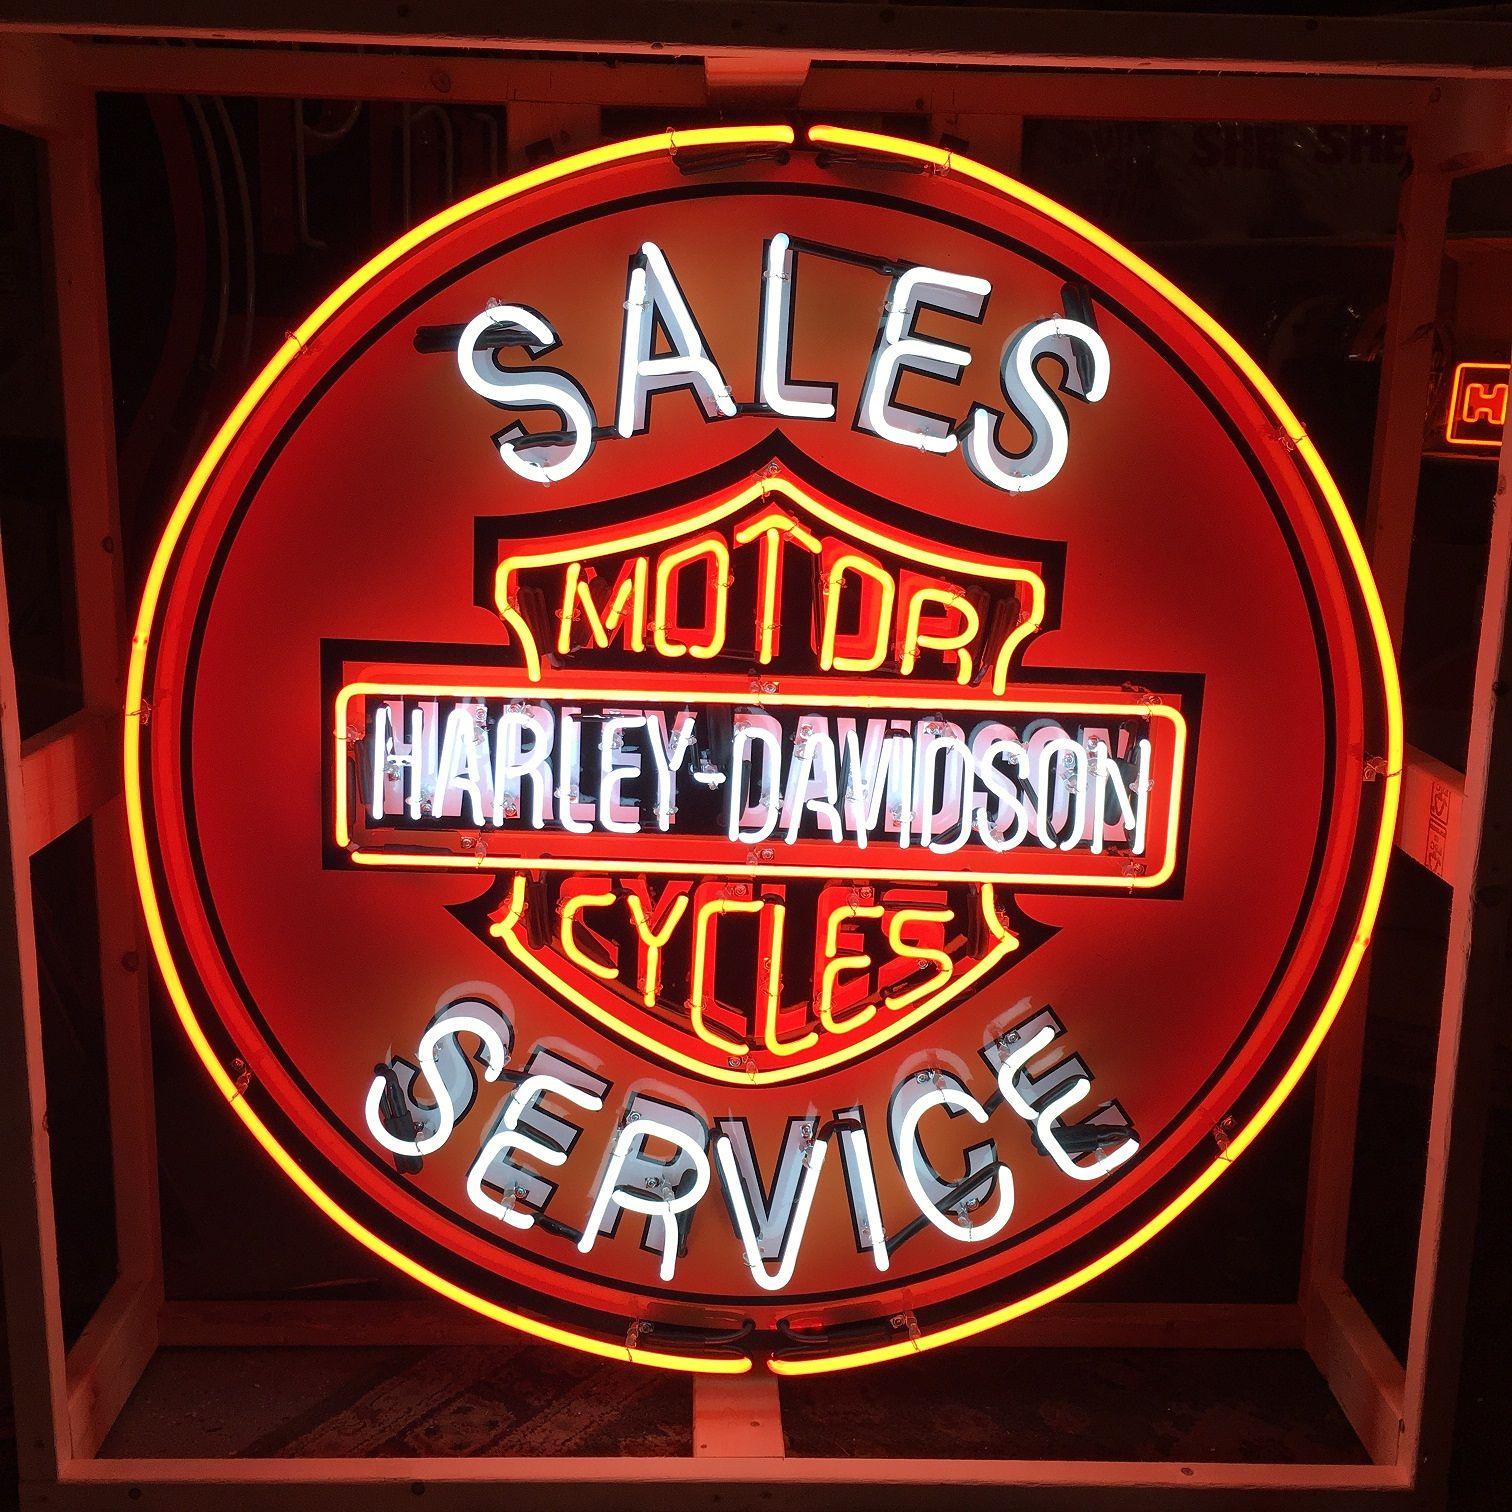 Harley Davidson Signs / Harley Davidson Sign / Harley